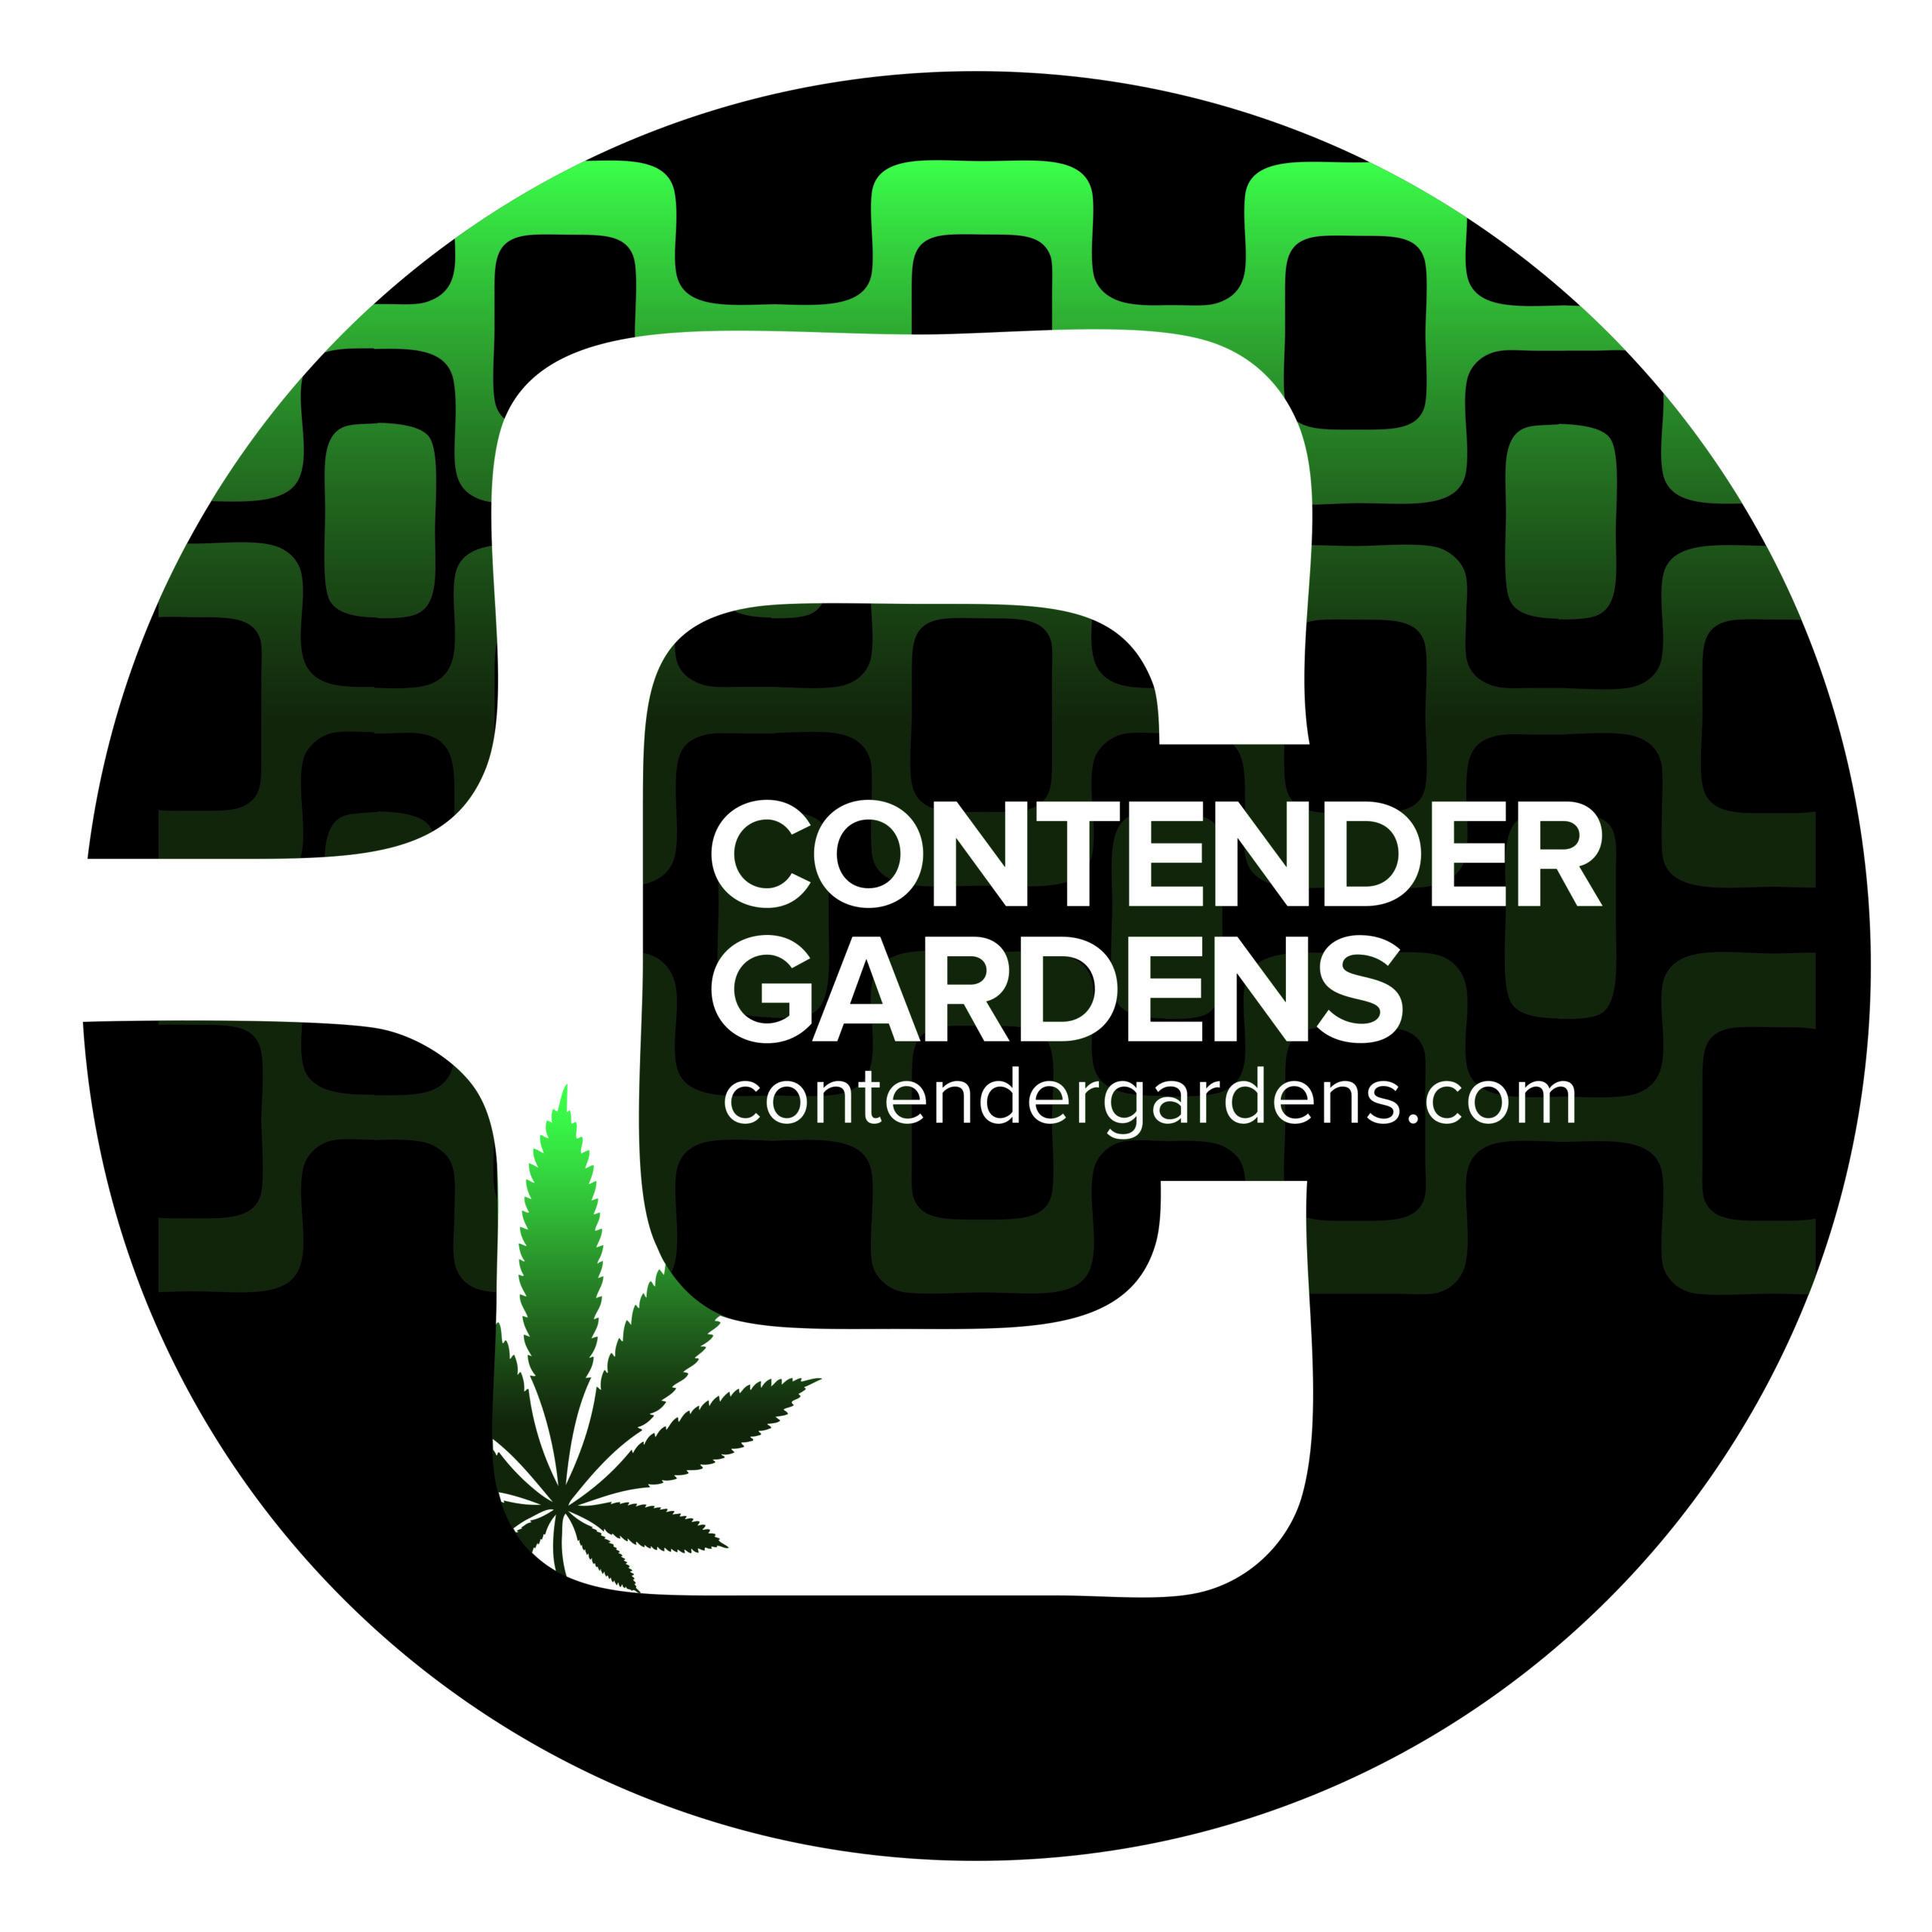 Contender Gardens